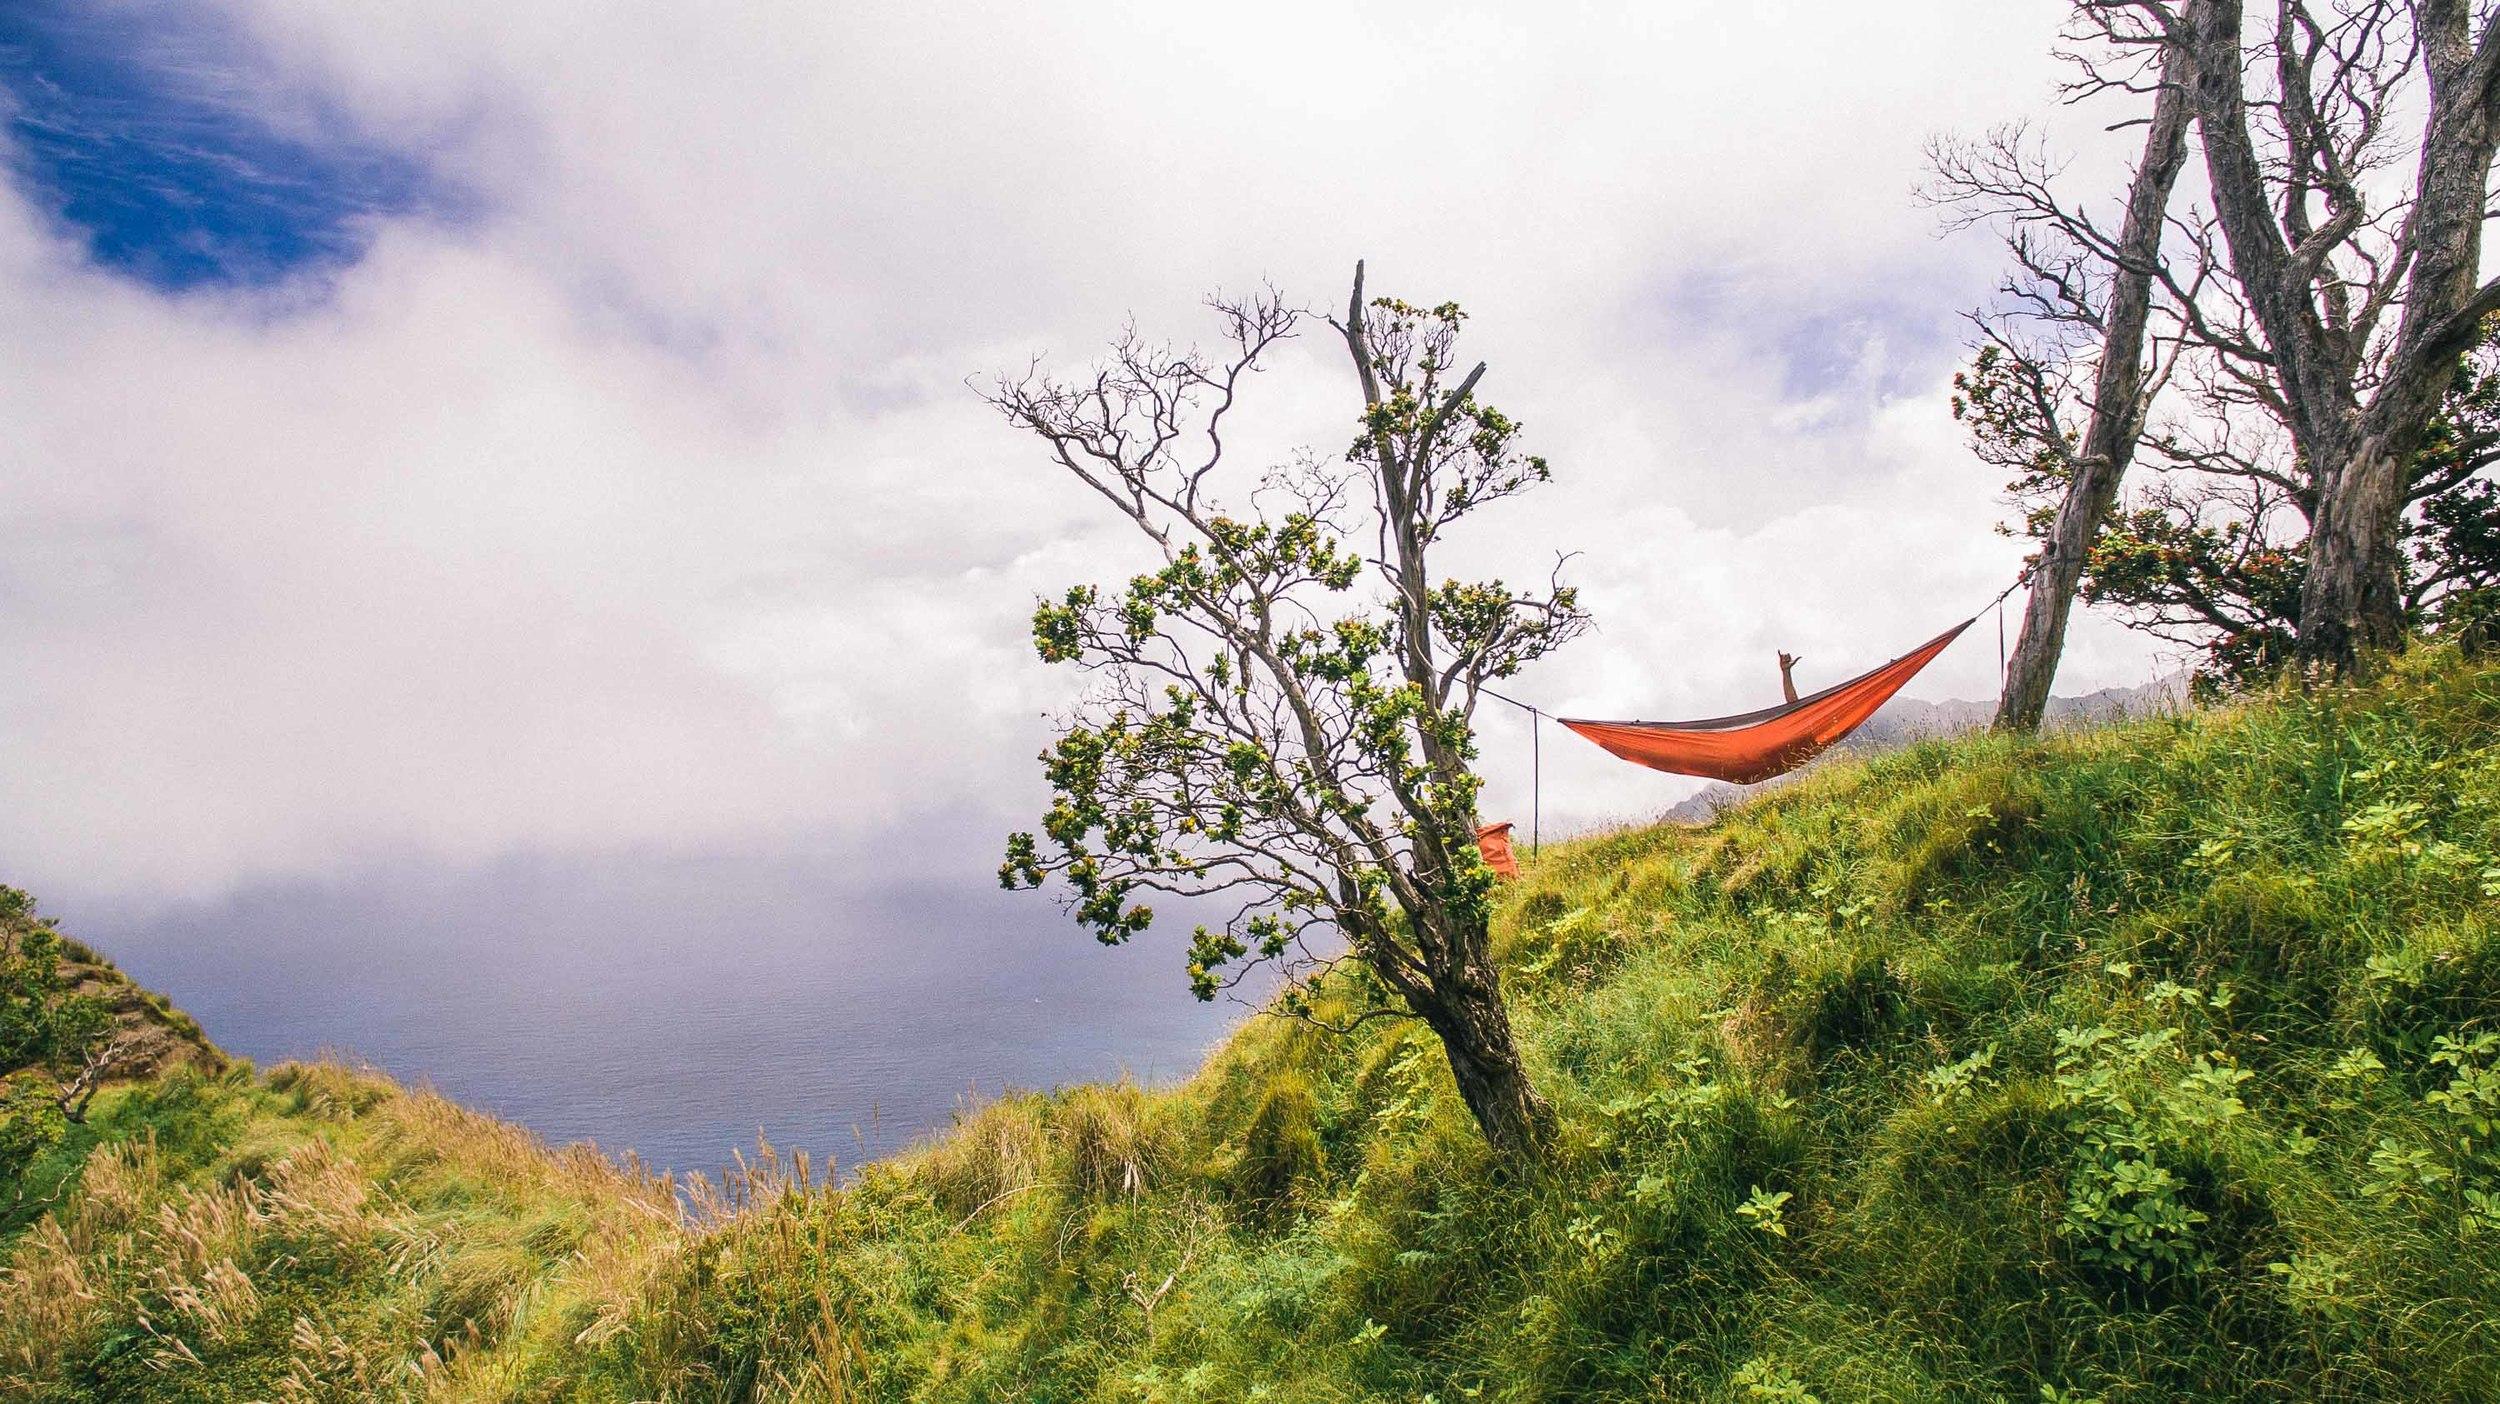 bryce-johnson-kalalau-ridge-kauai-hiking-hammock-palmwood-aloha-exchange-20.jpg